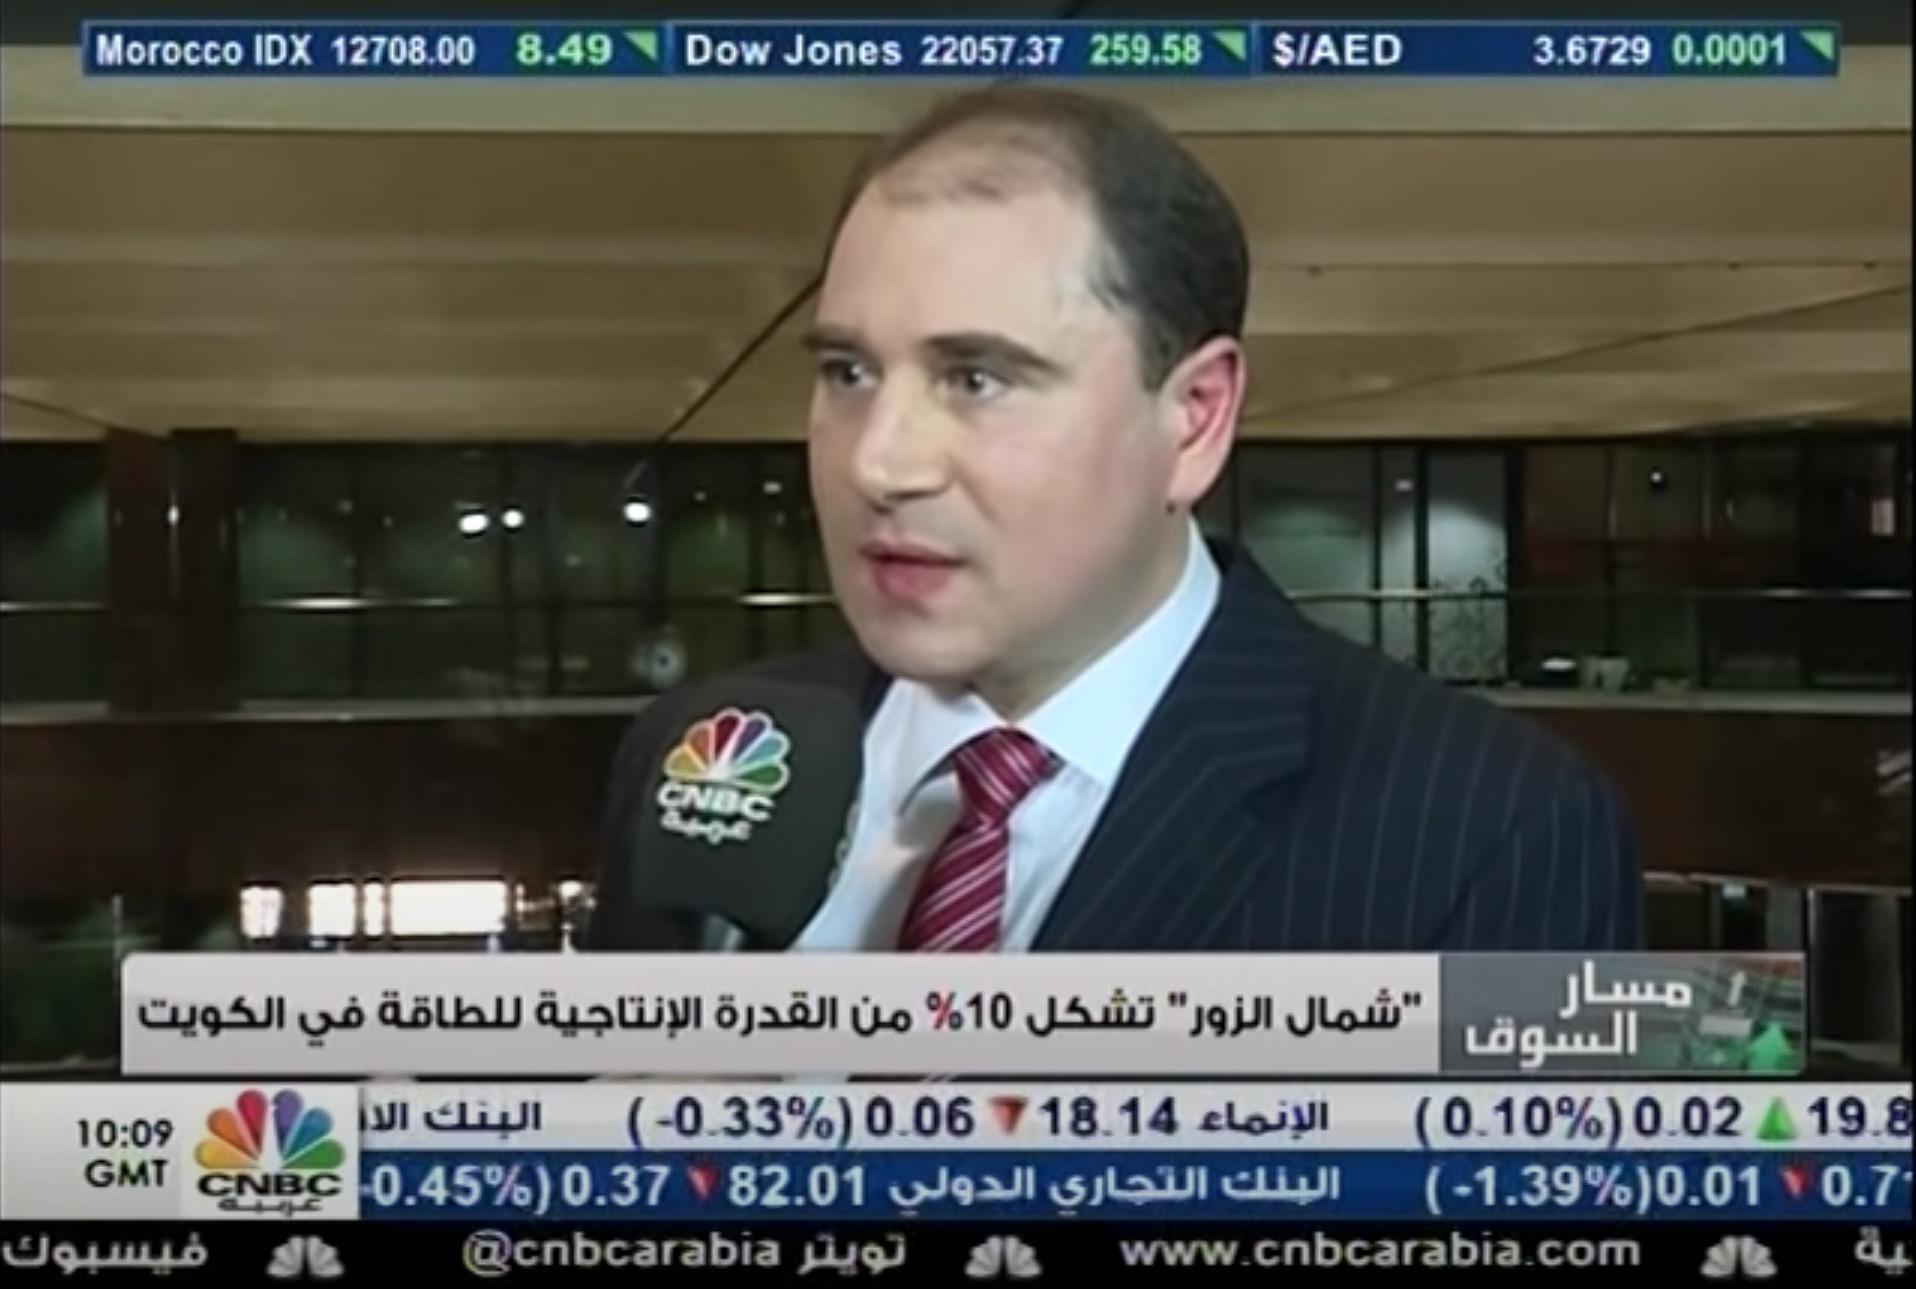 NBK Capital Executive Director Mr. Rachad Challah's interview on CNBC Arabia TV